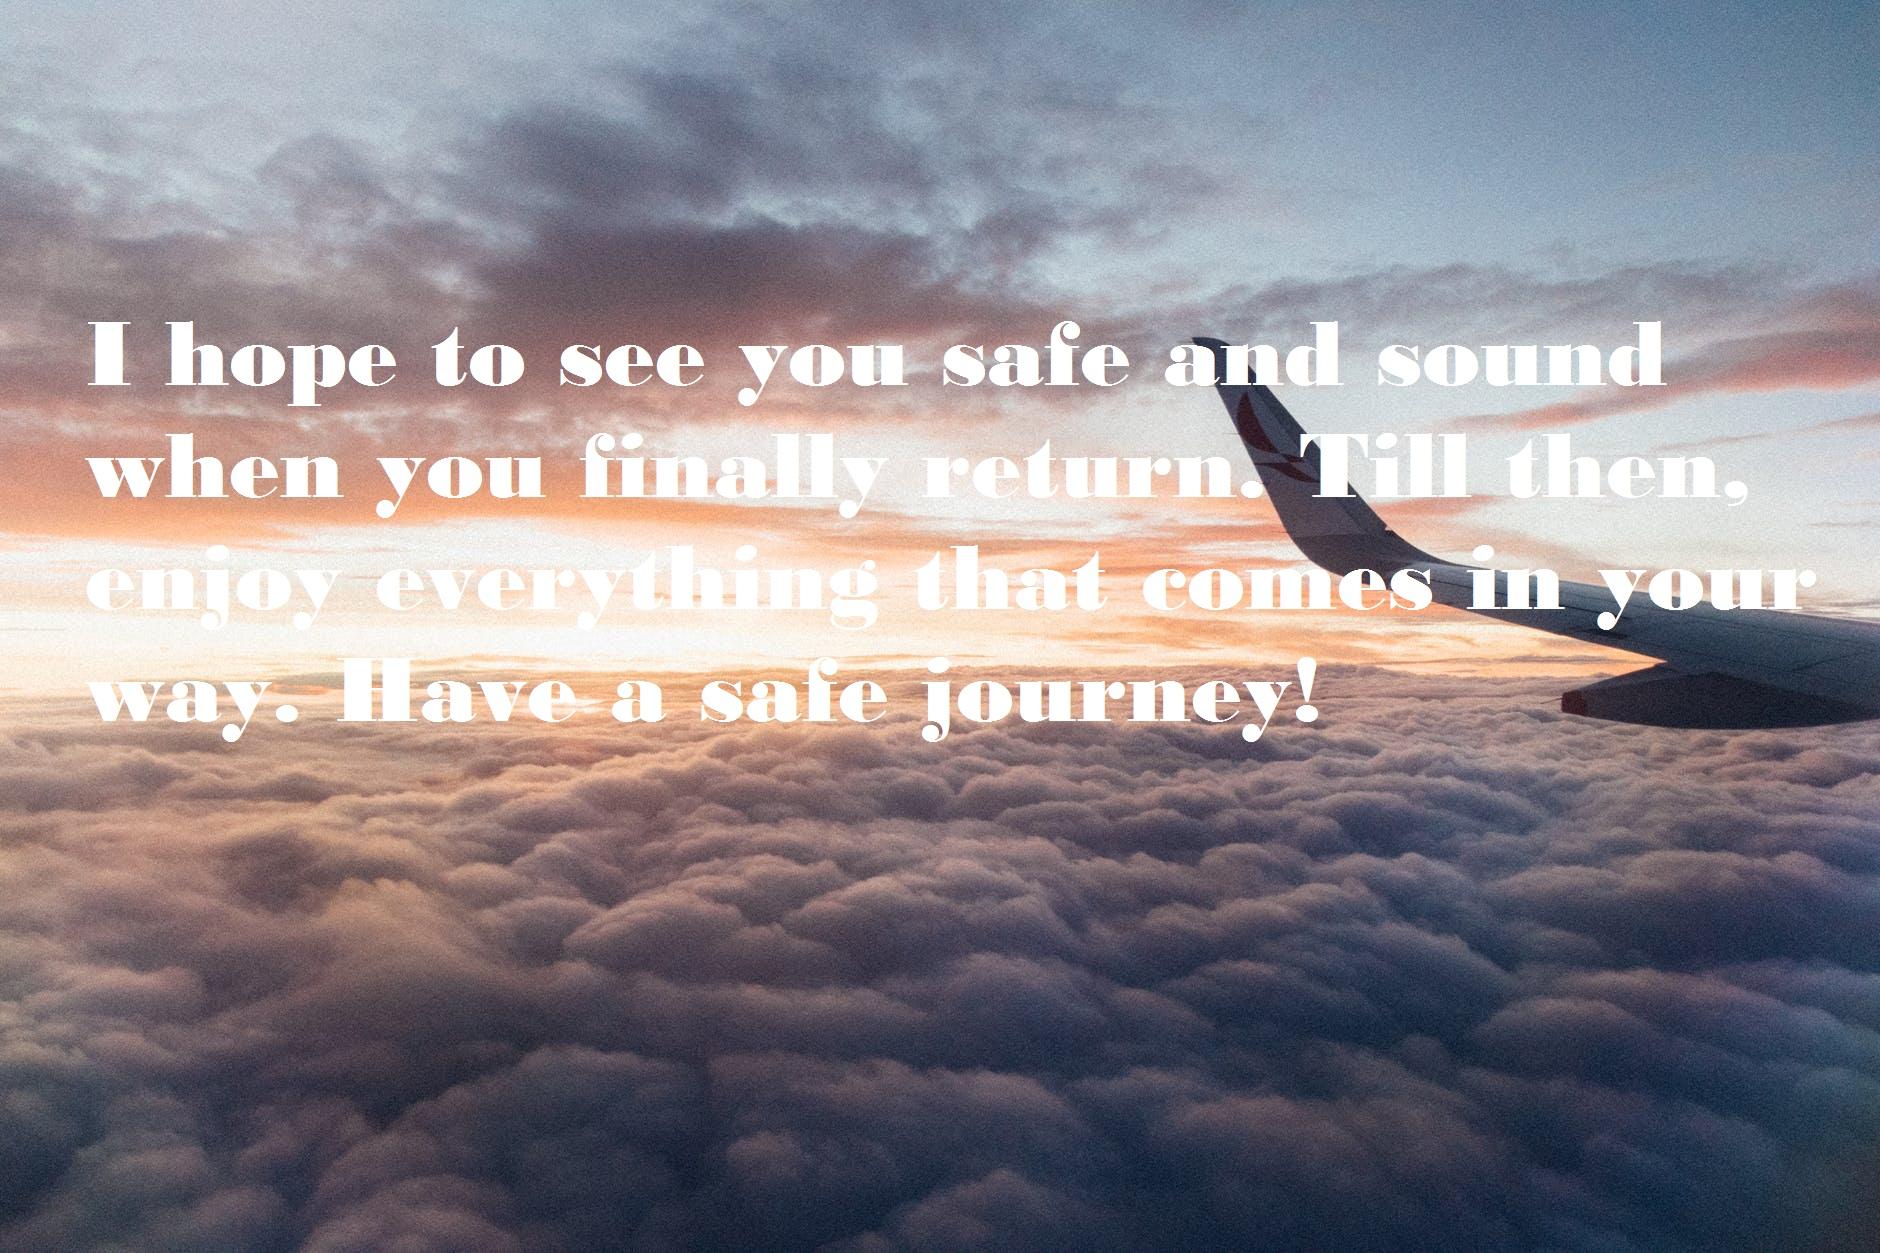 Safe Journey Wishes for Husband